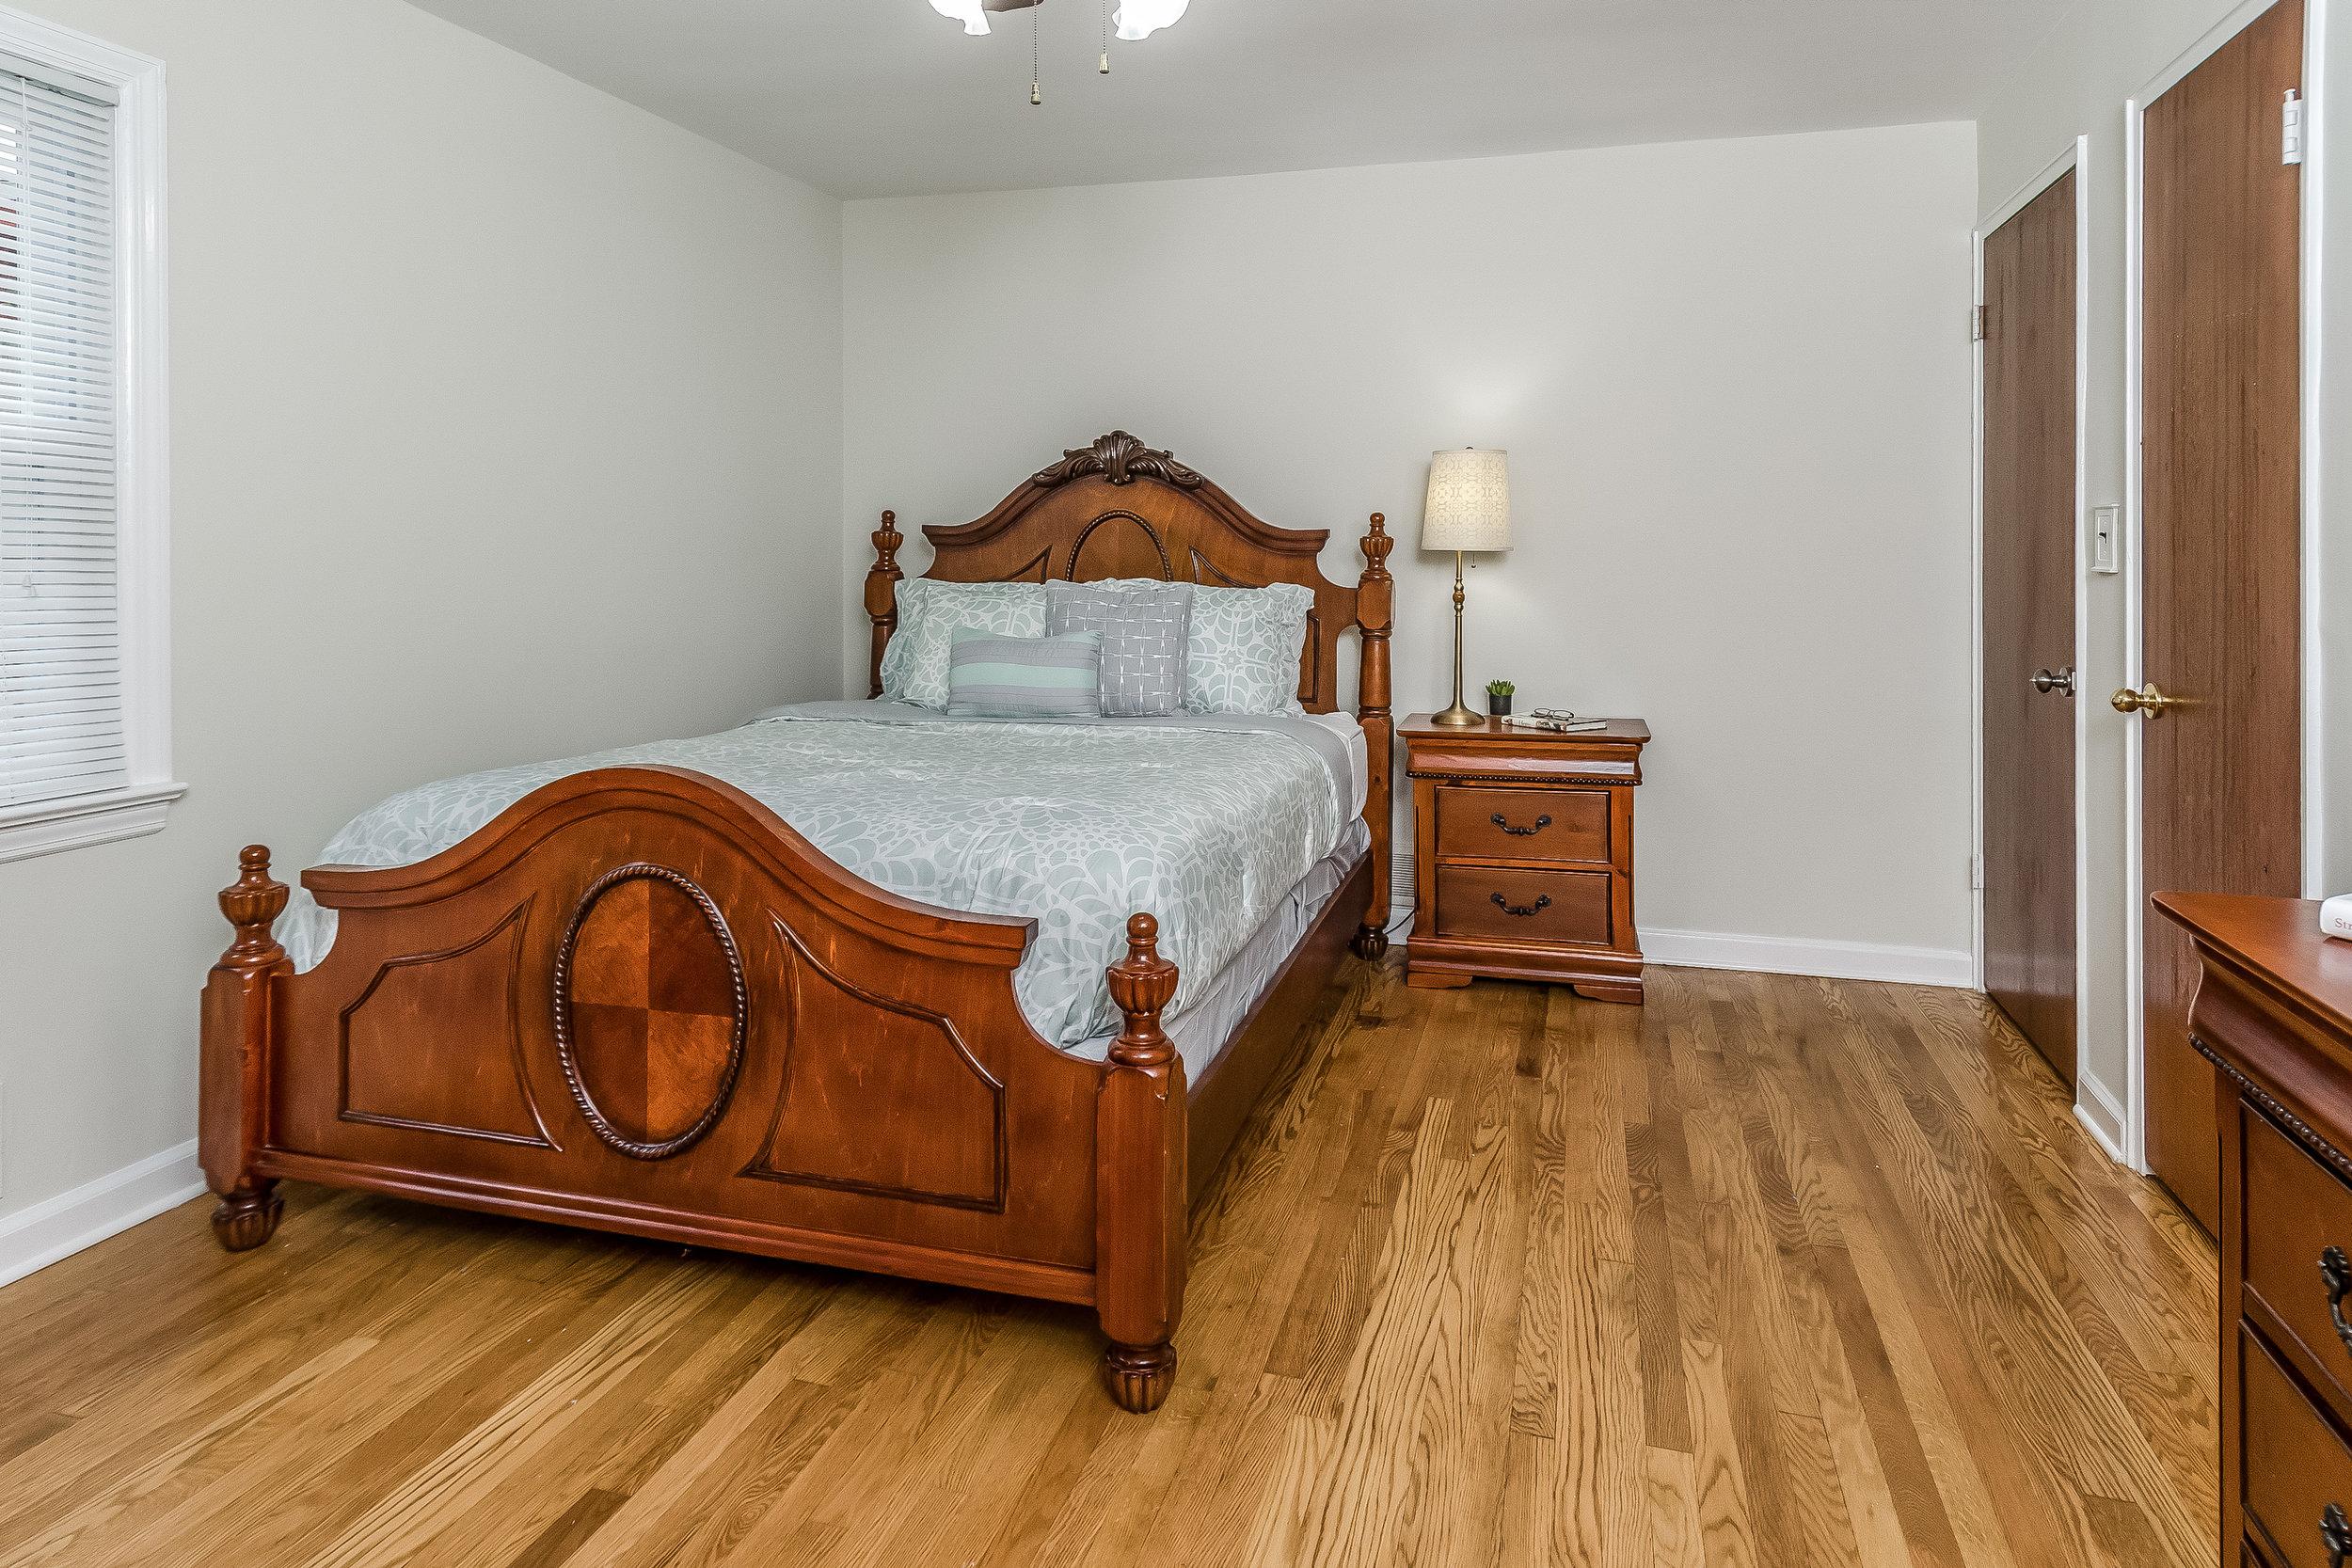 020-photo-master-bedroom-5786539.jpg